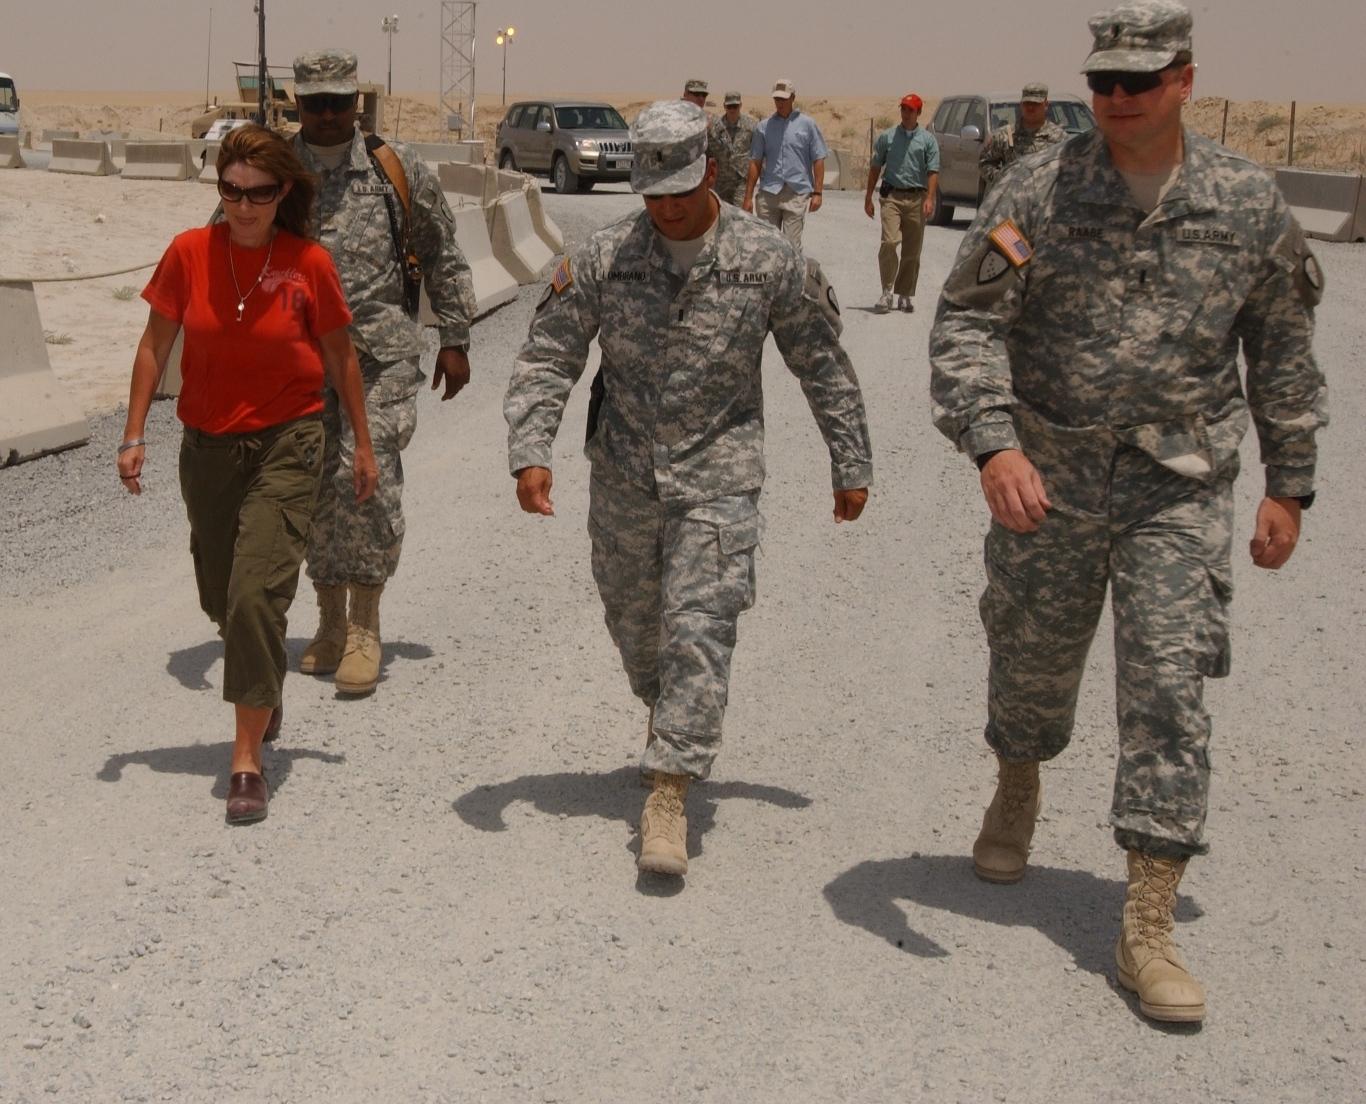 https://i1.wp.com/upload.wikimedia.org/wikipedia/commons/4/4e/Sarah_Palin_Kuwait_1.jpg